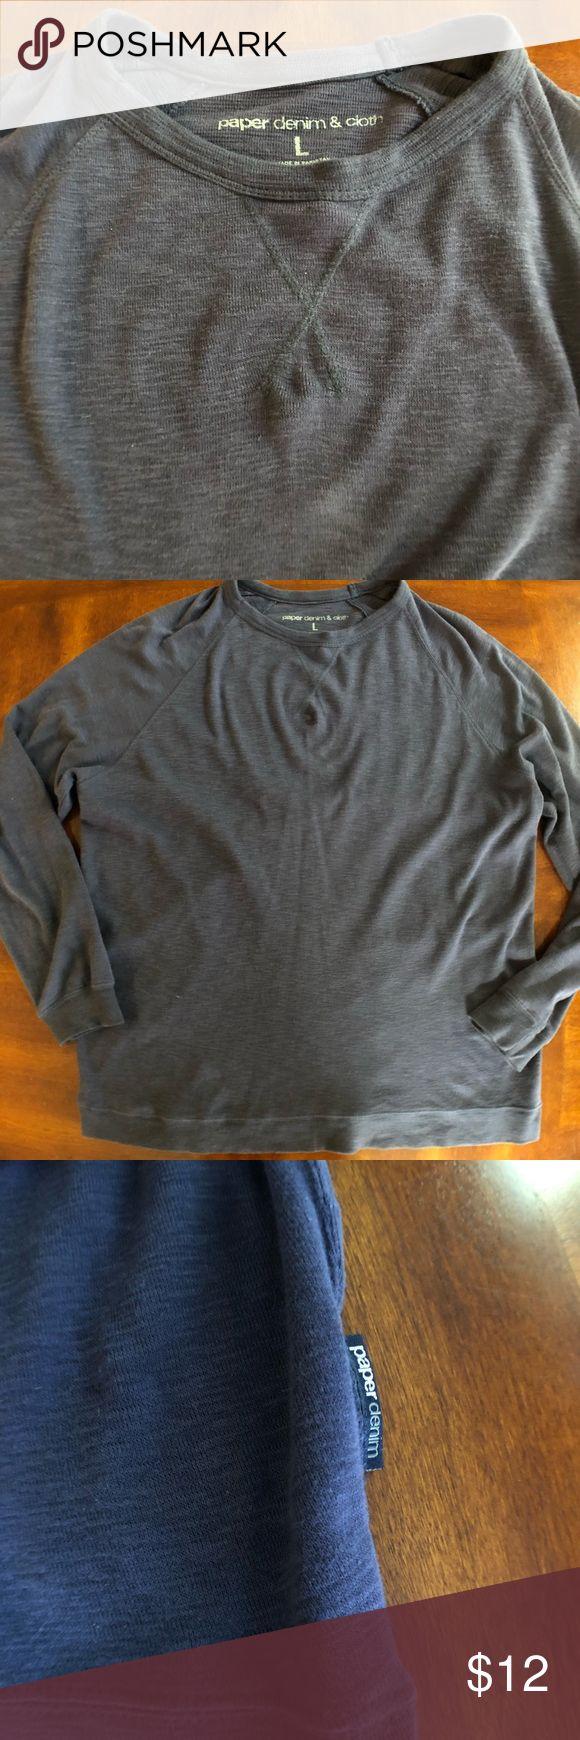 Paper Denim long sleeve shirt Men's Paper Denim size Large long sleeve blue shirt. Good used condition Paper Denim & Cloth Shirts Tees - Long Sleeve